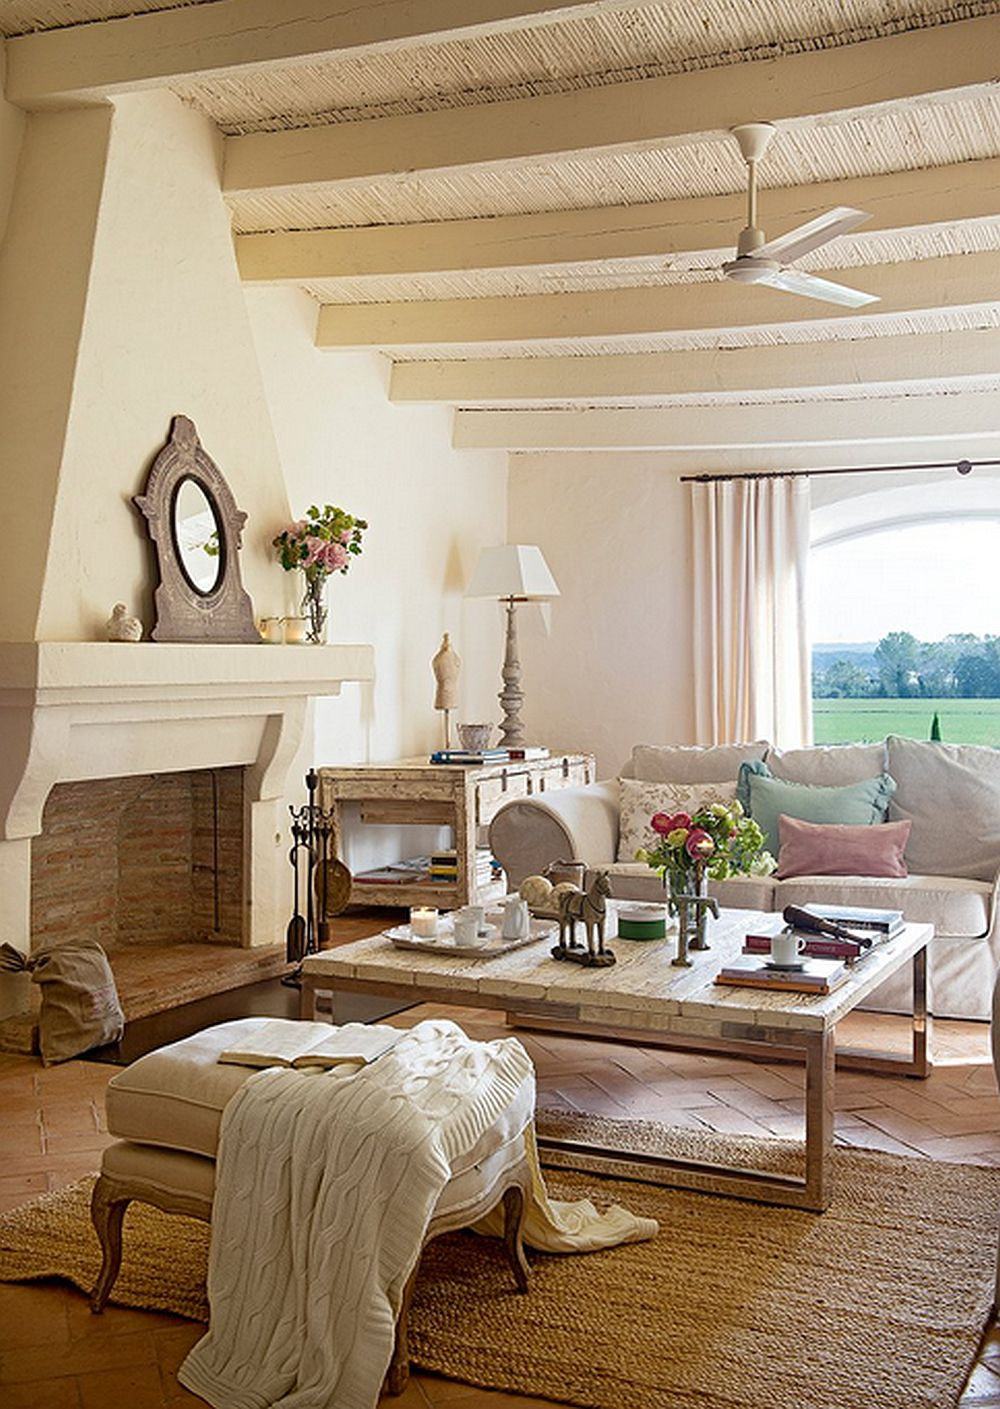 adelaparvu.com despre casa rustica Spania, hambar transformat in casa, arhitecti Lluís Auquer si Ferran Prats (12)